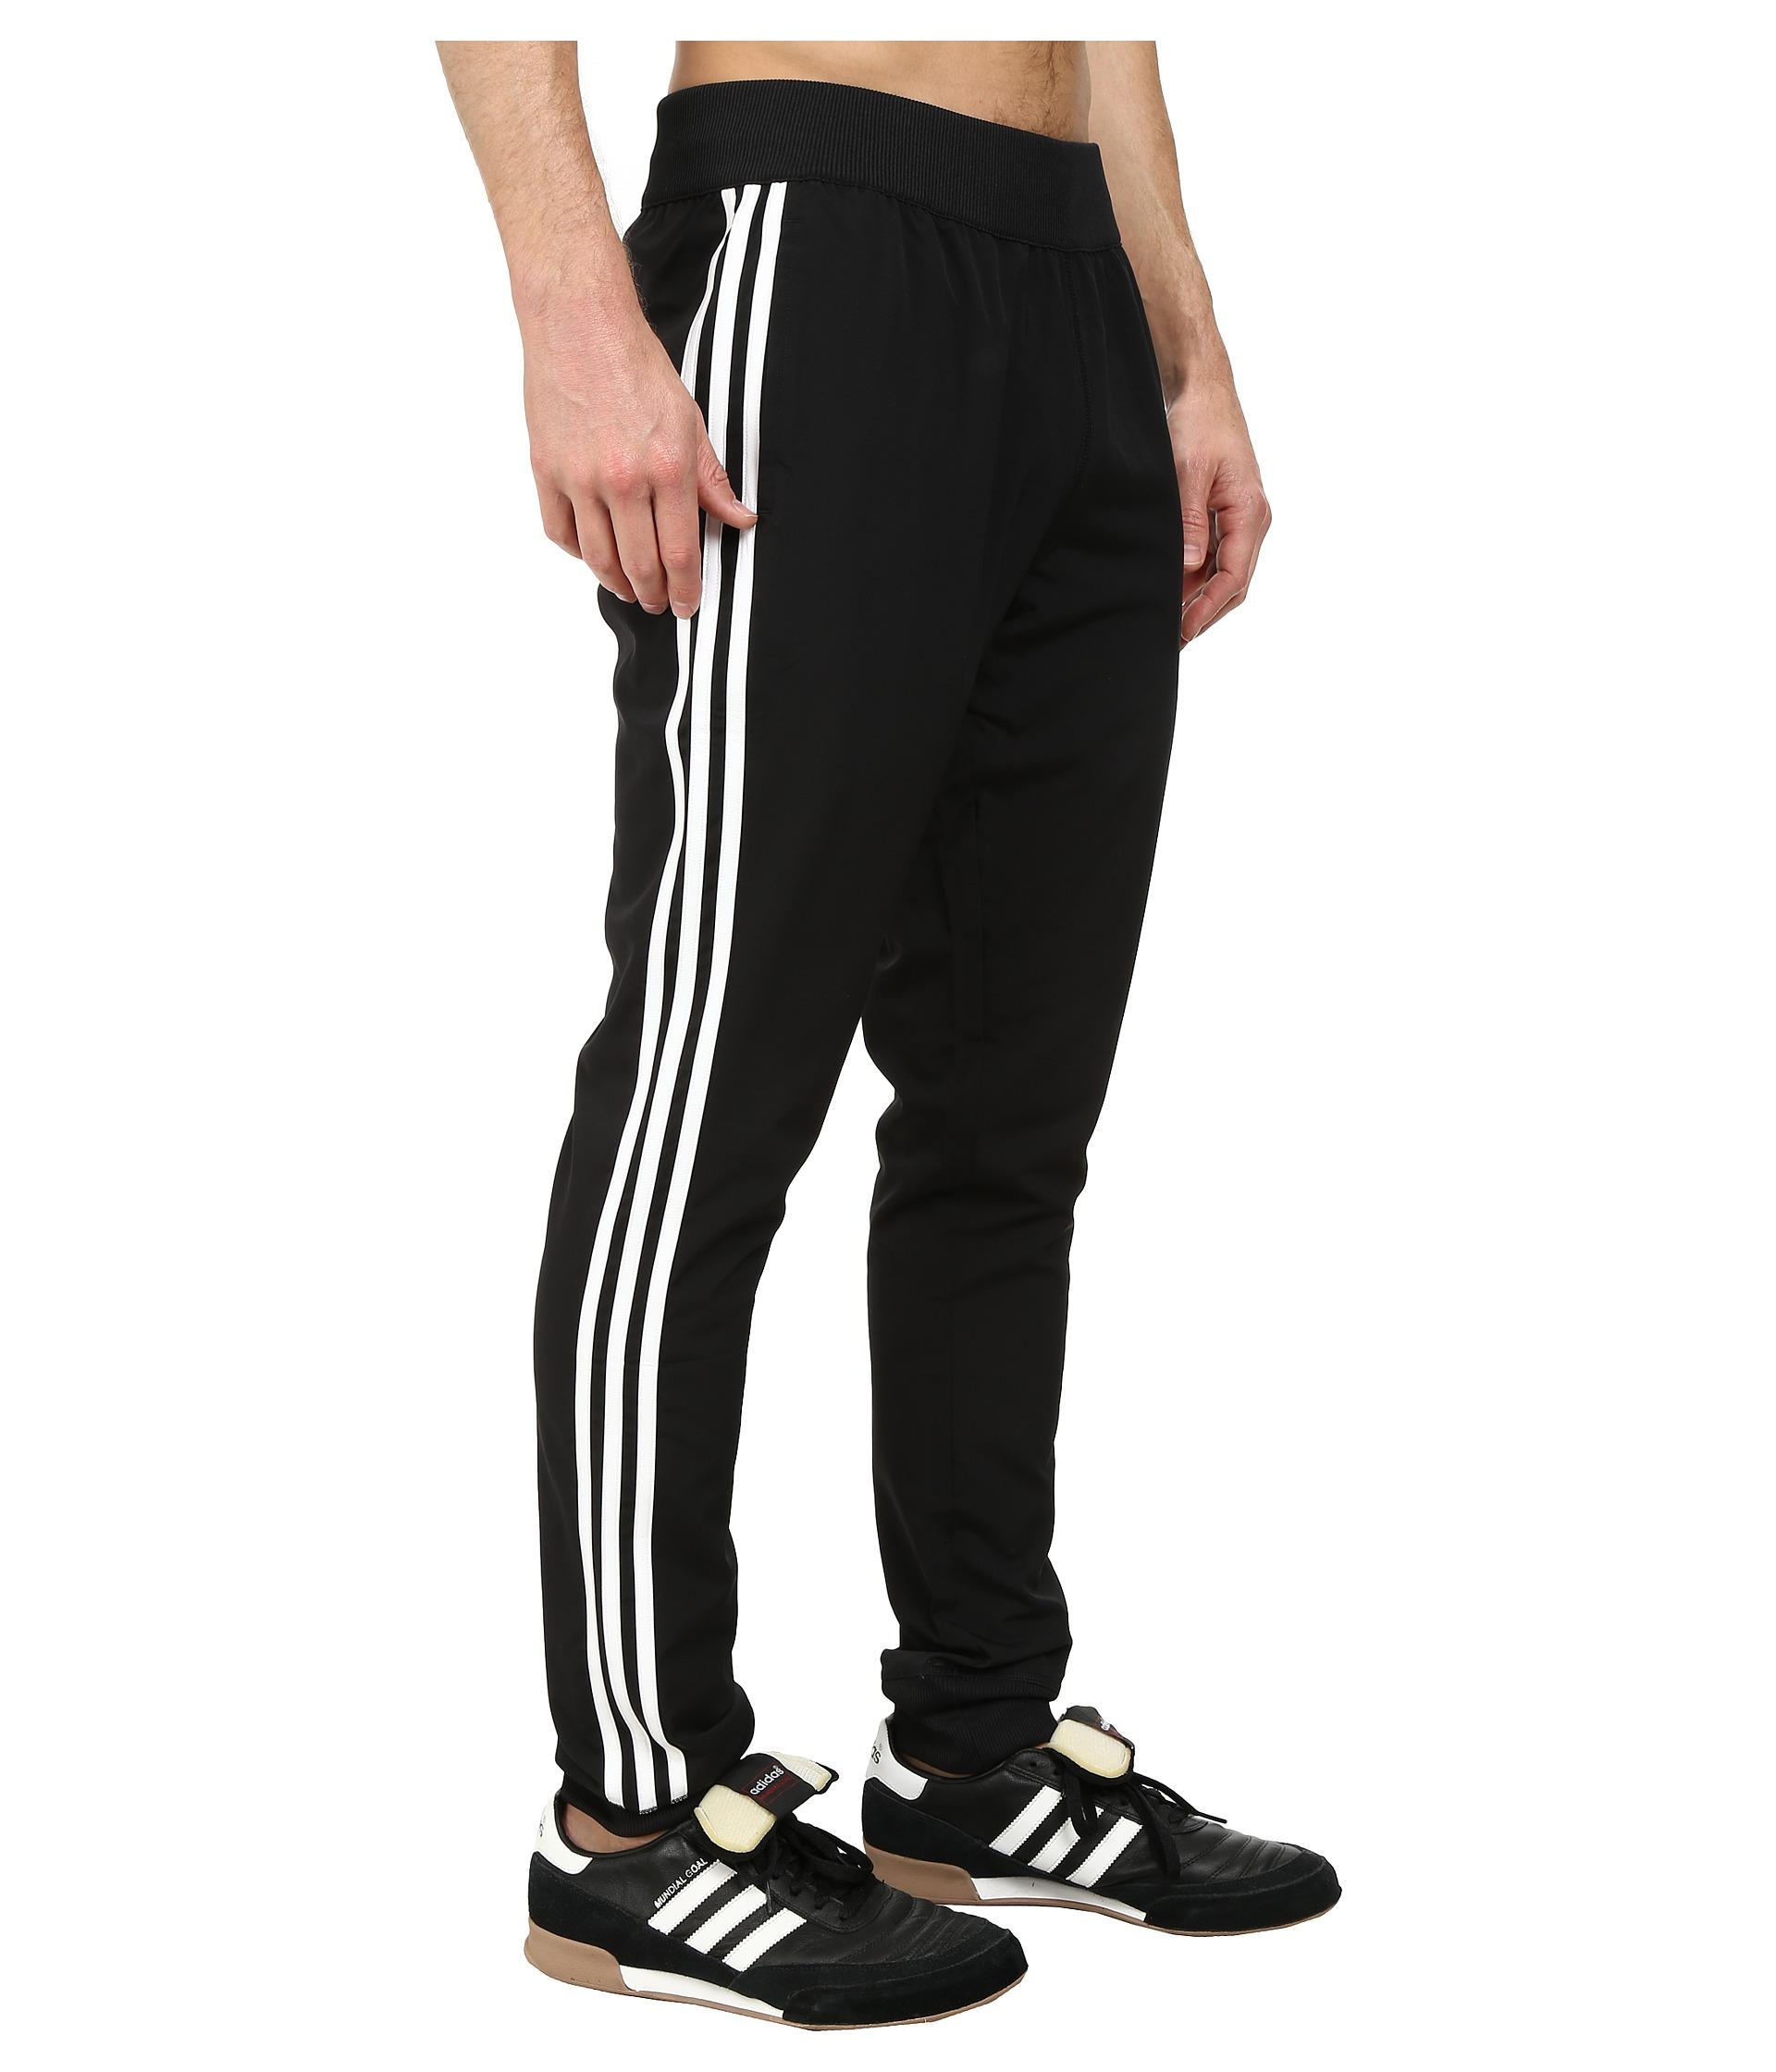 skinny fit adidas track pants